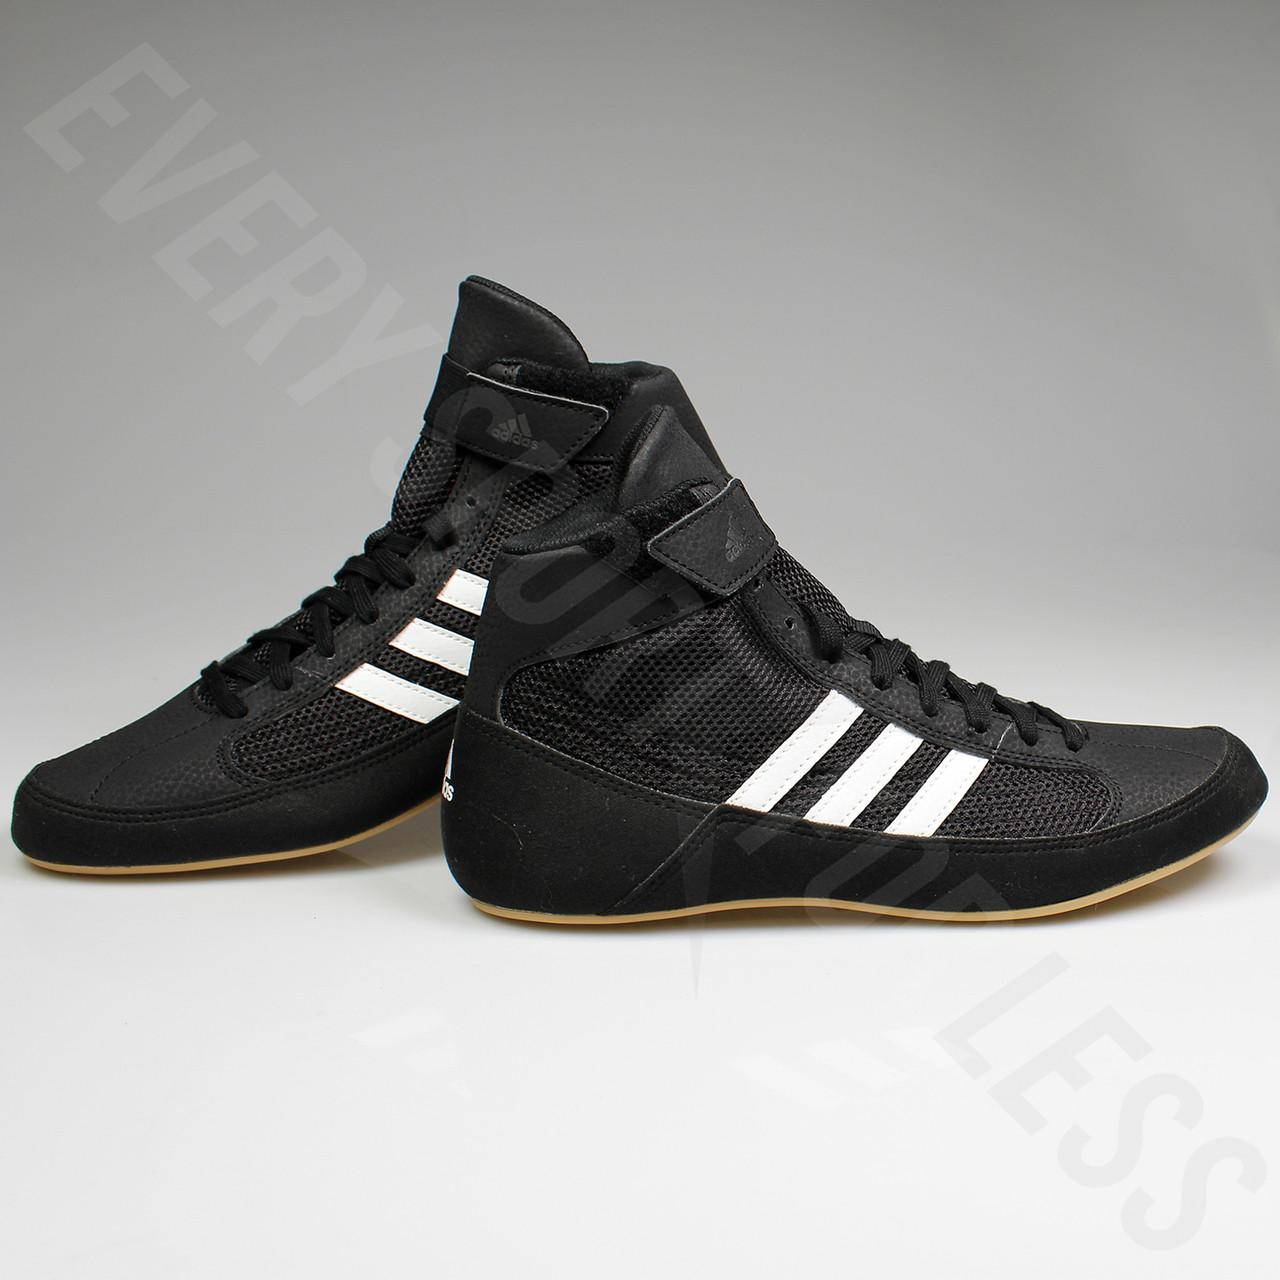 size 40 964b0 954af adidas HVC 2 Youth Wrestling Shoes 2 AQ3327 Athletic